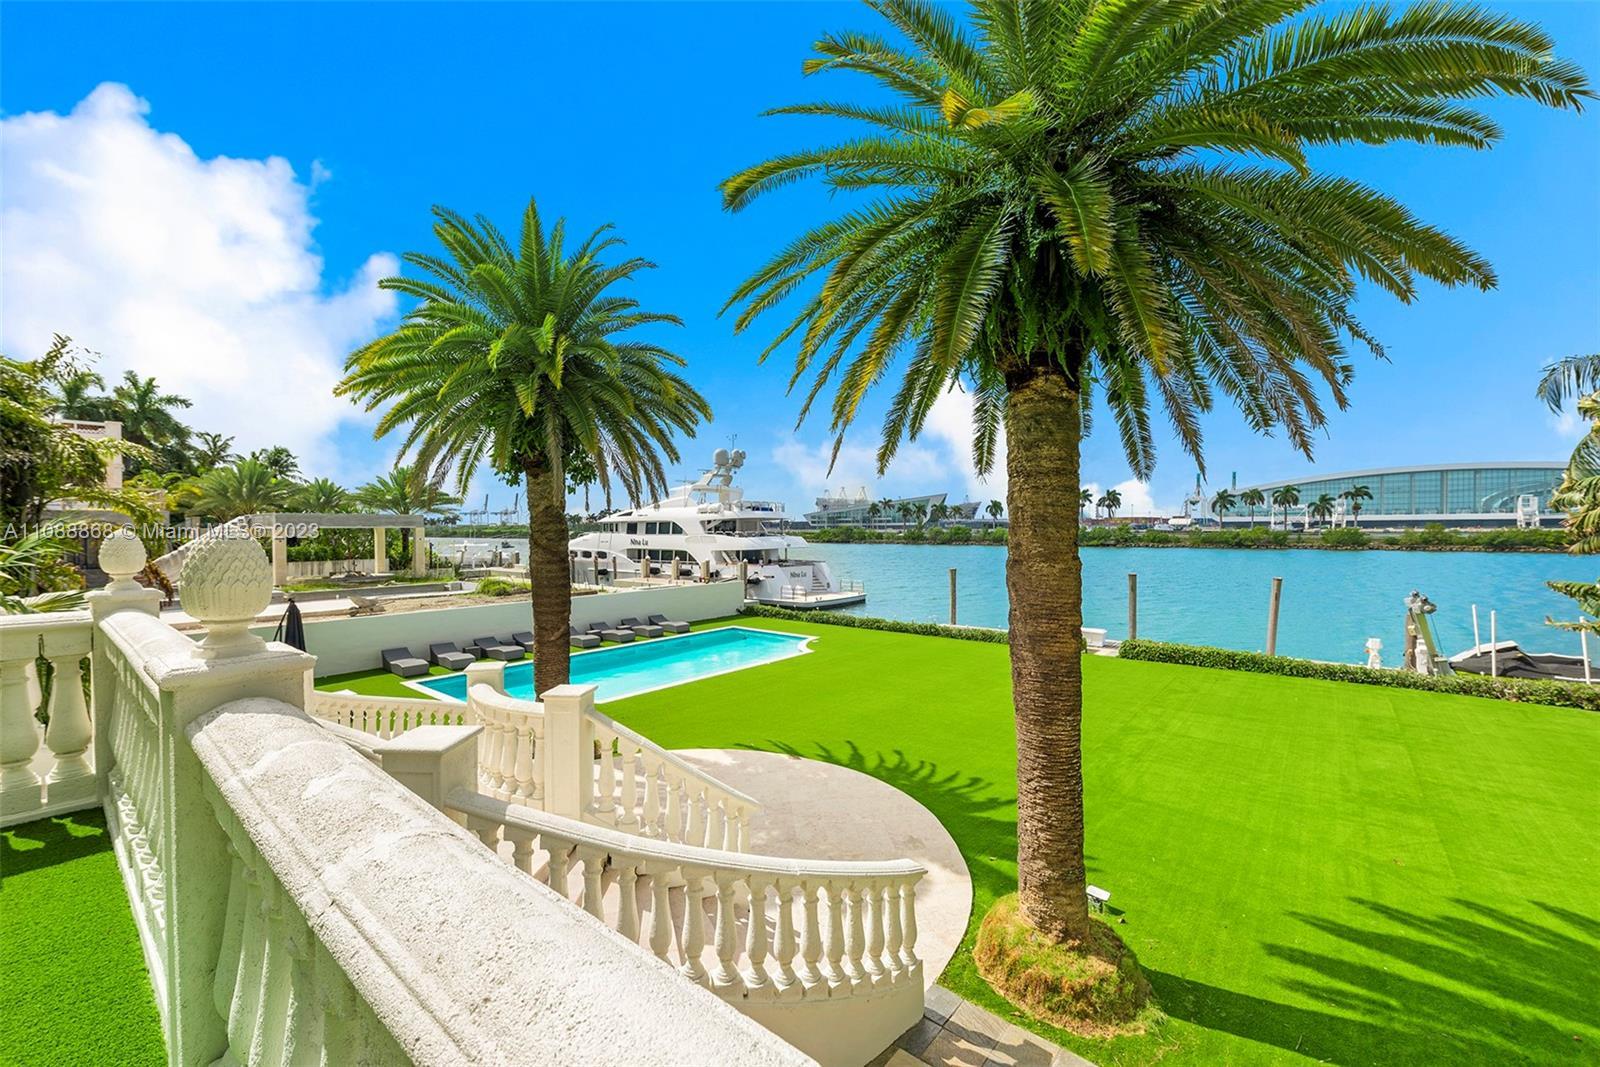 70 Palm Ave, Miami Beach FL 33139